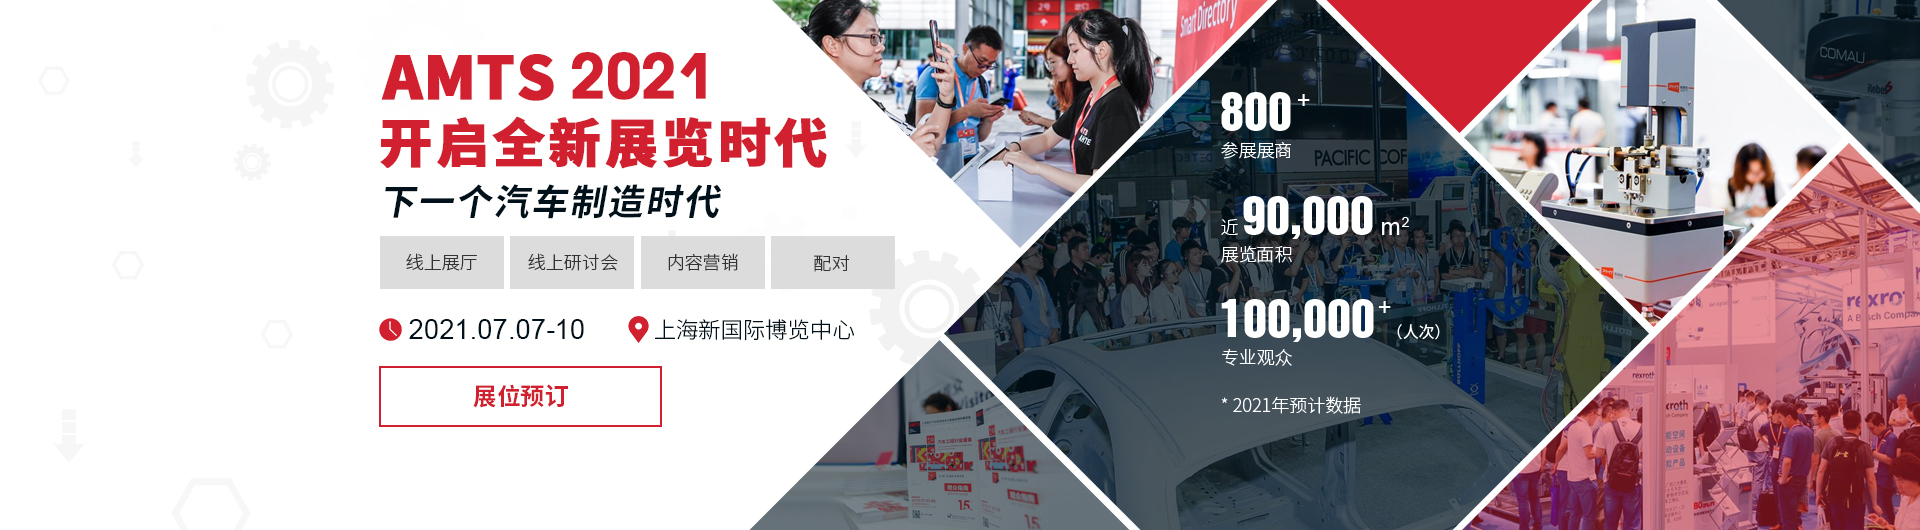 AMTS 2021 全新展览时代-cn